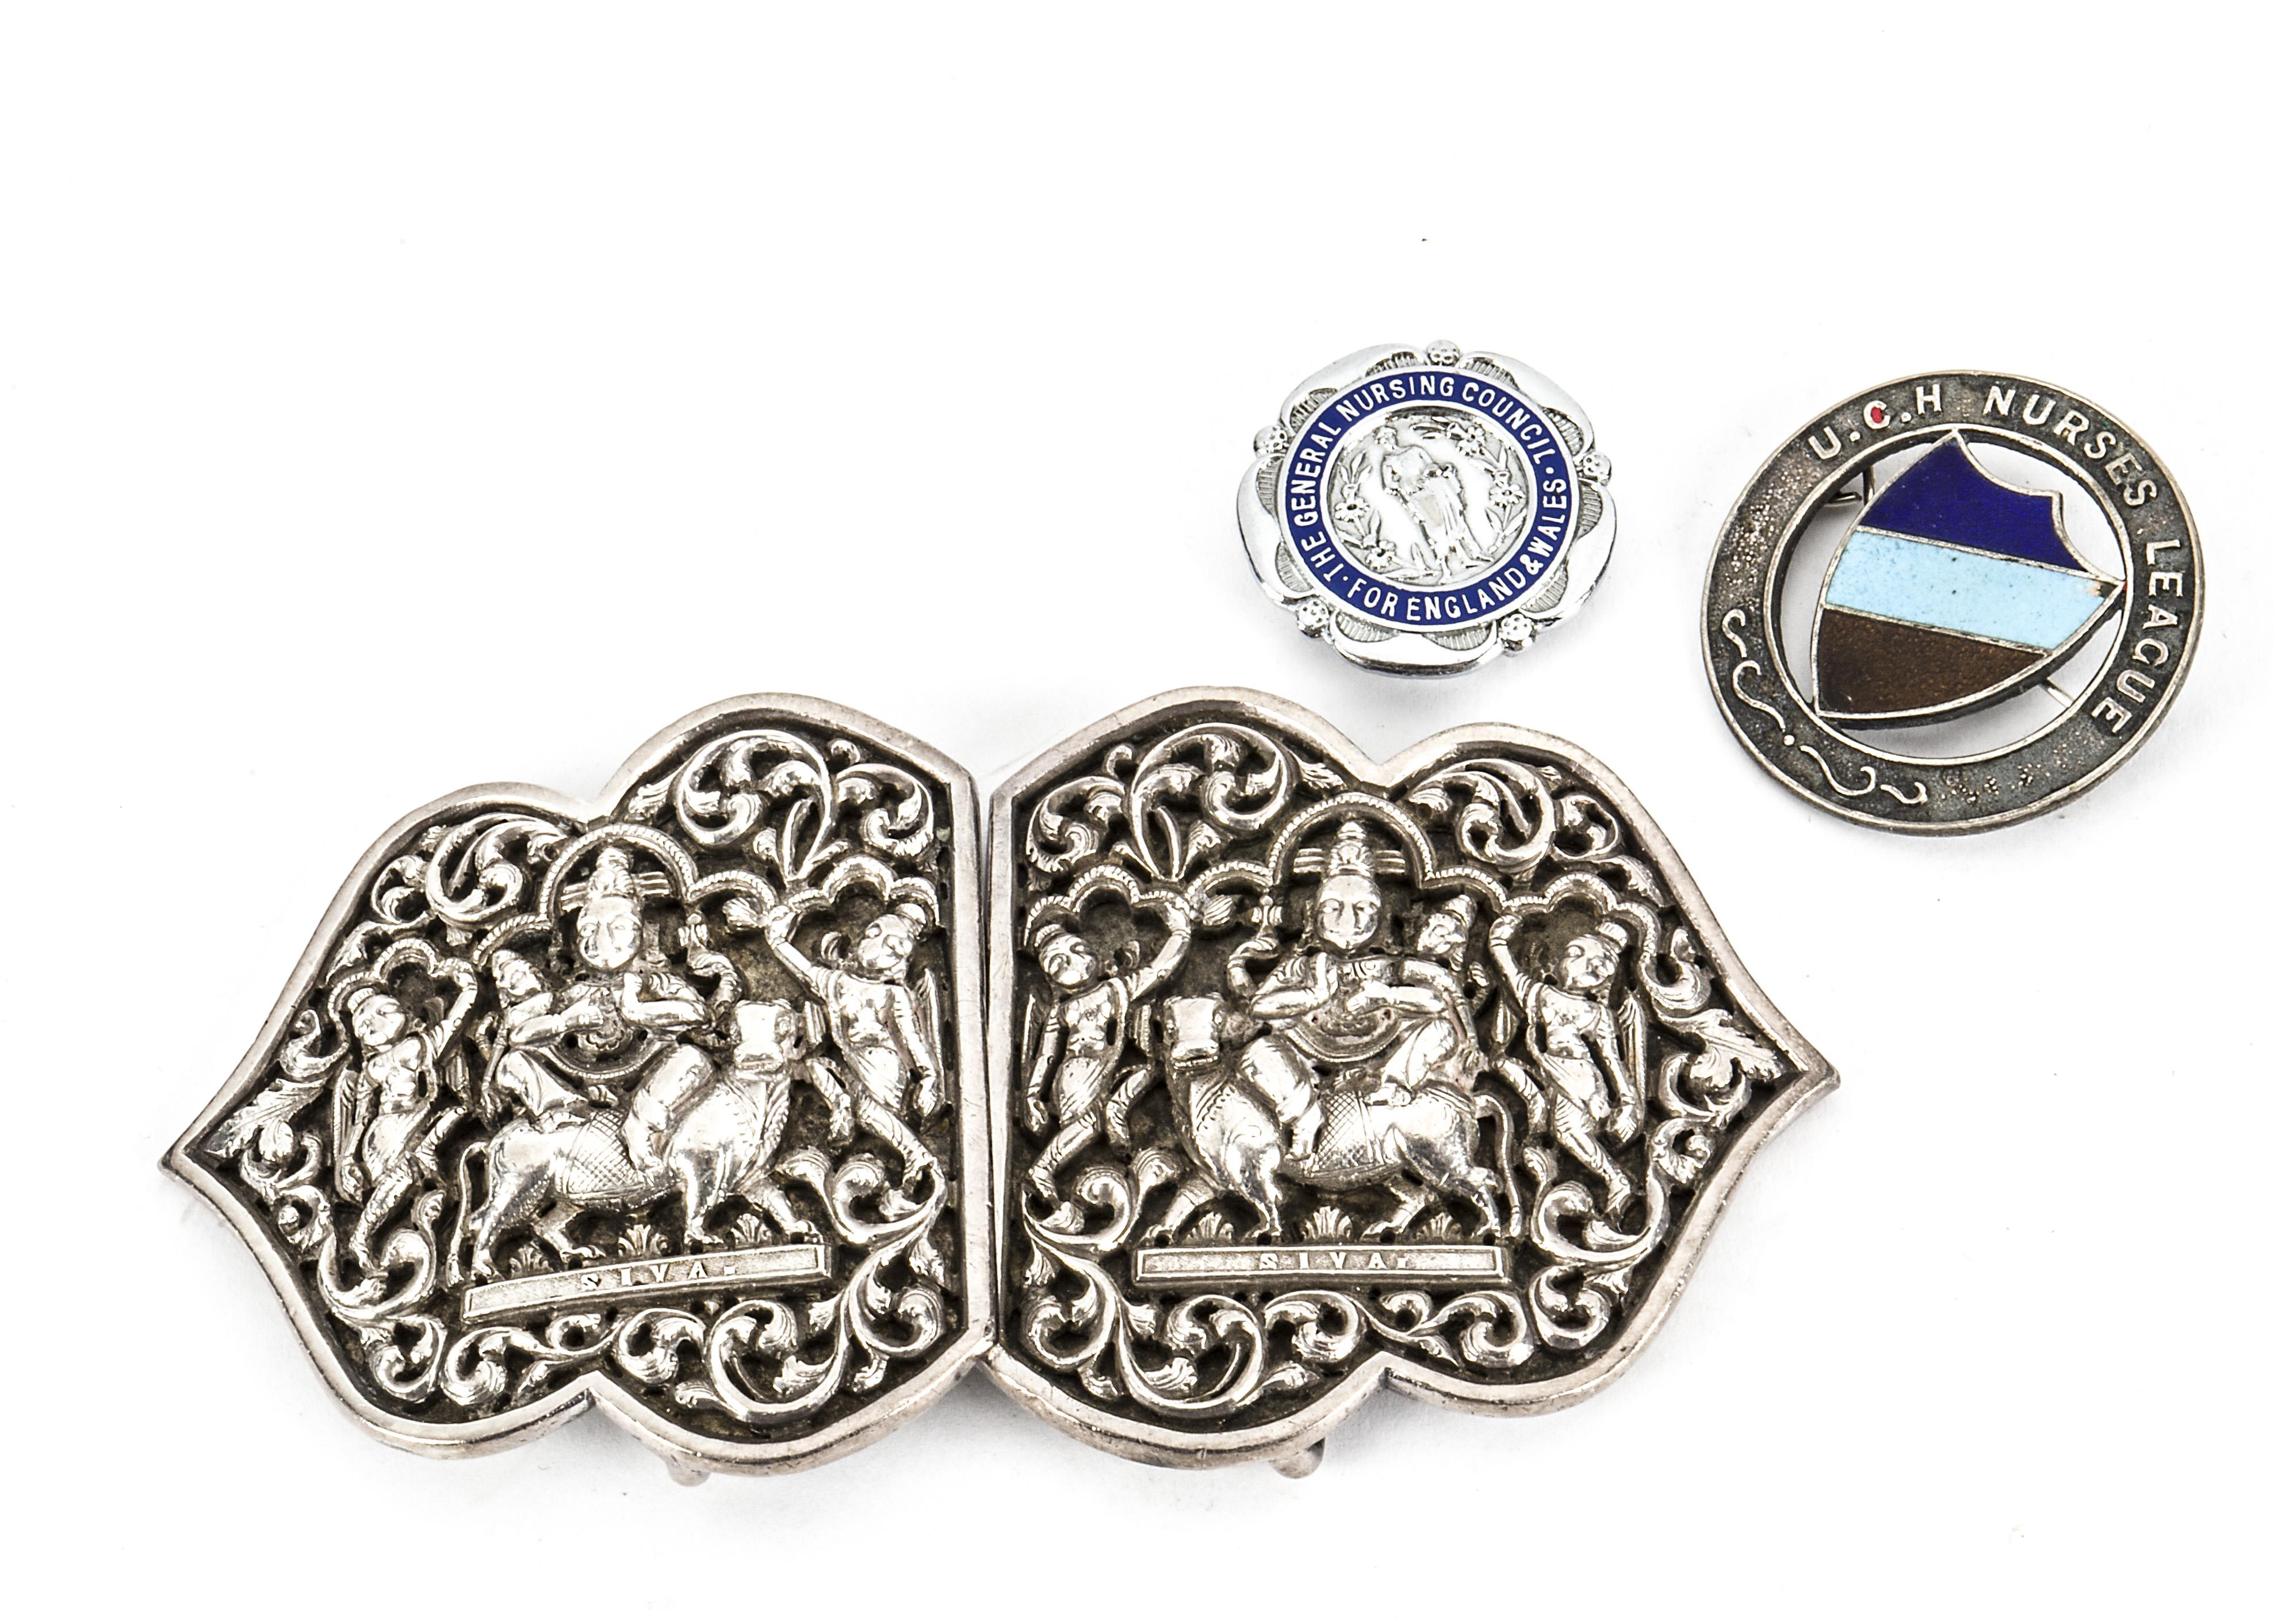 Lot 35 - A vintage Indian silver nurse's belt buckle, together with two nurse's badges (4)